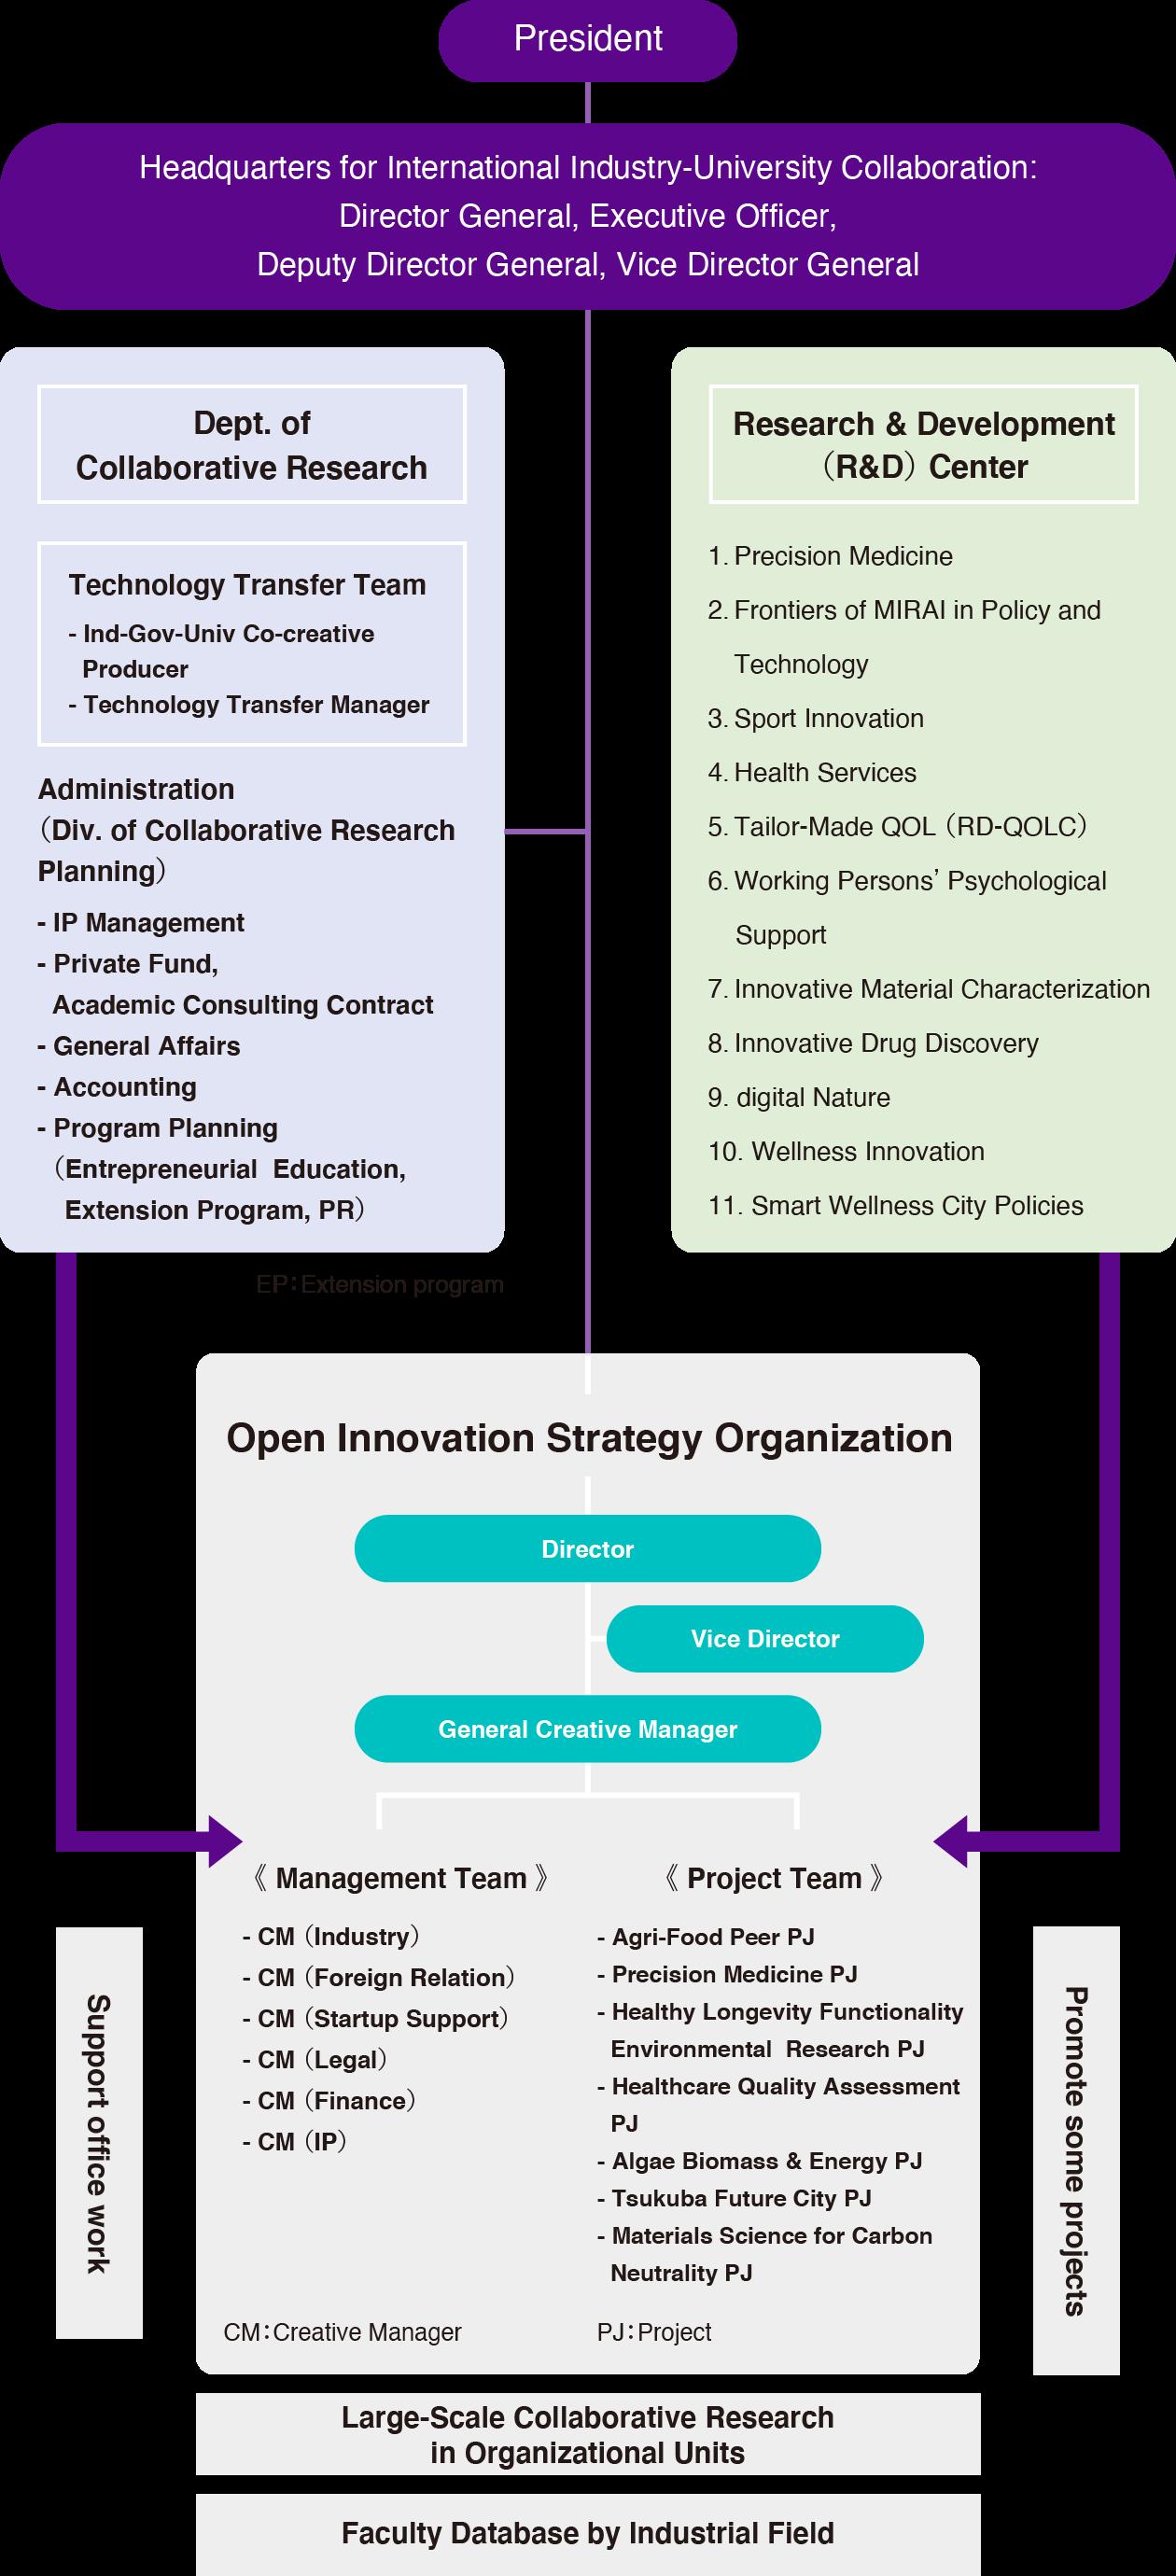 Open Innovation Strategy Organization Chart|OISO